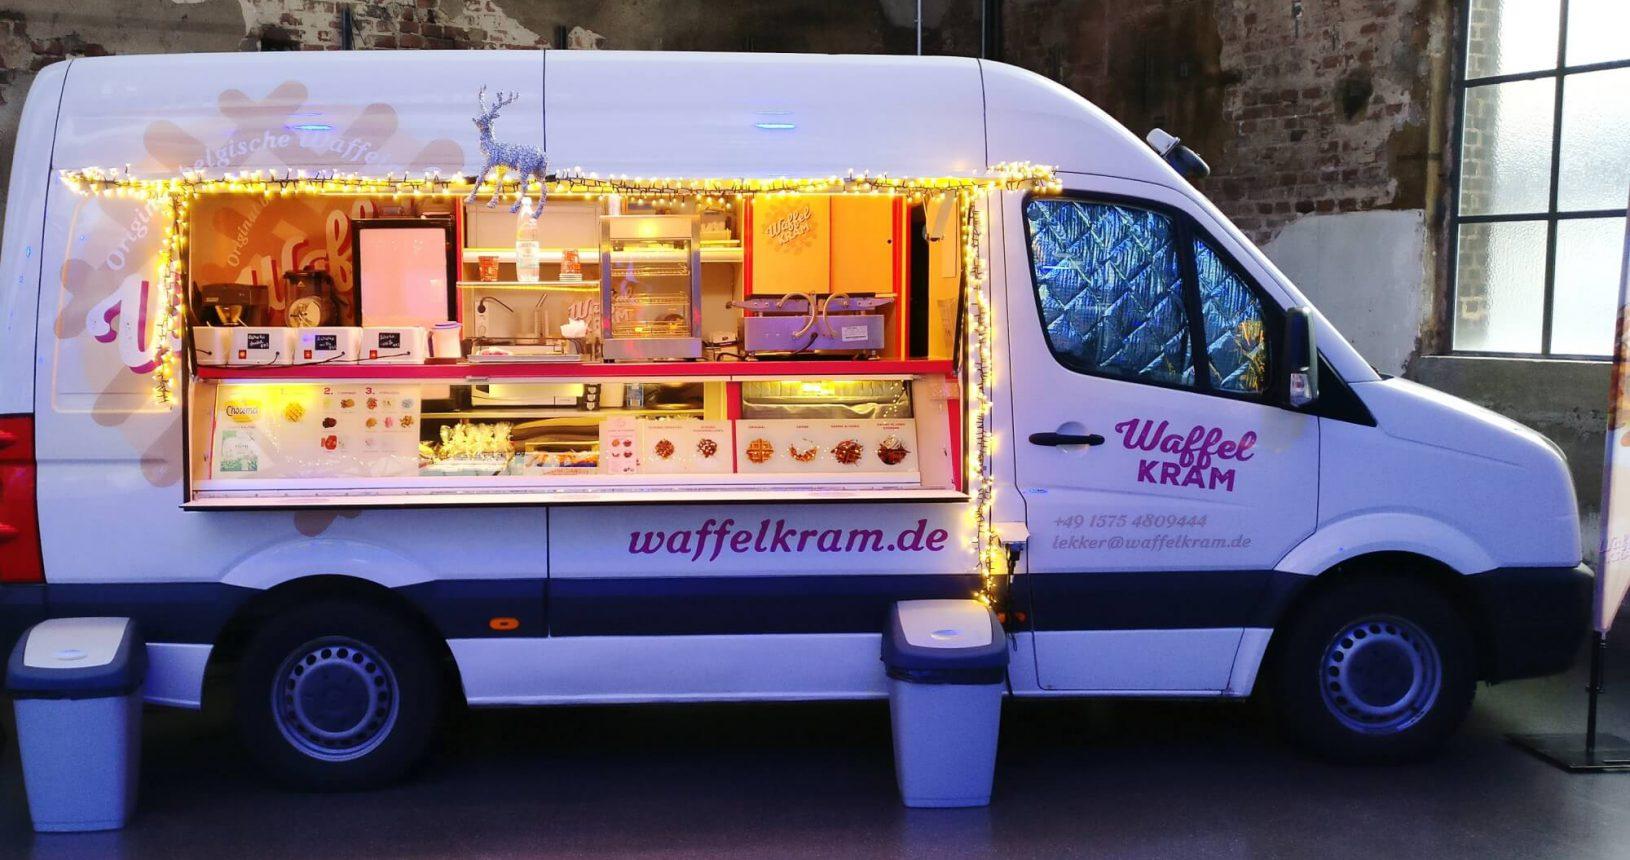 Waffelkram Nachtisch Dessert Waffel Food Truck Catering Streetfood Köln Bonn